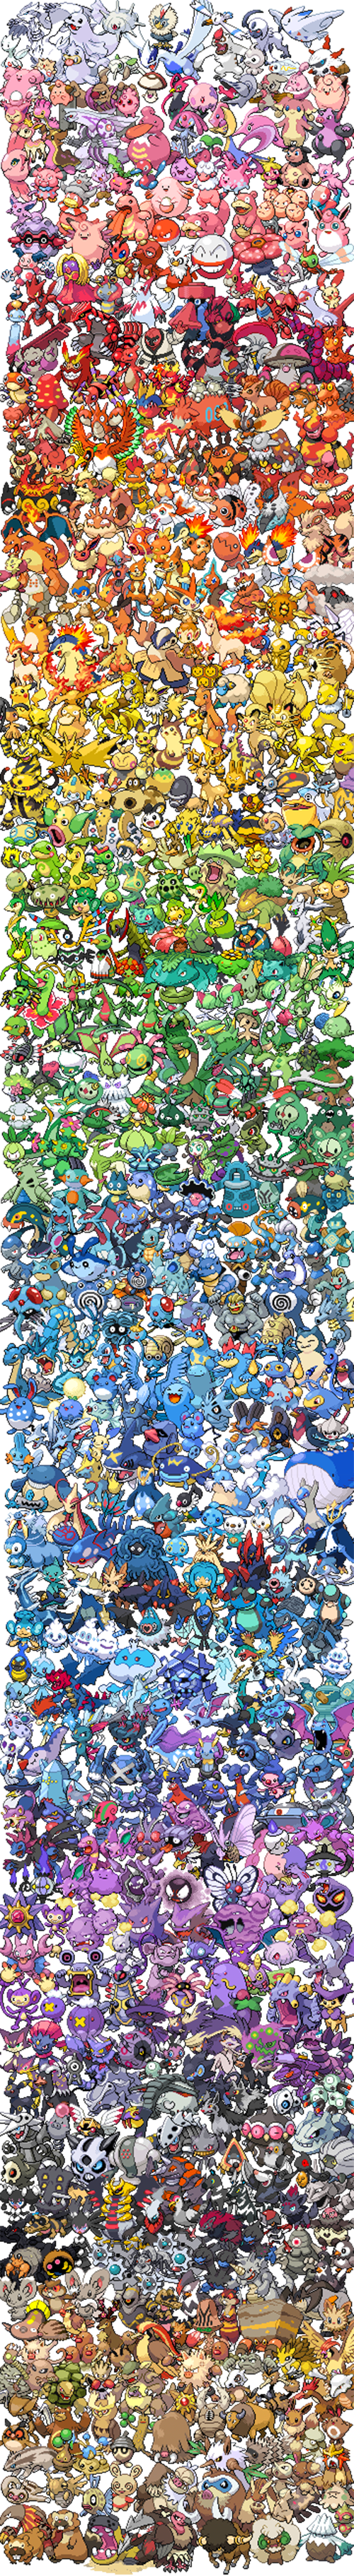 Shades of Pokémon